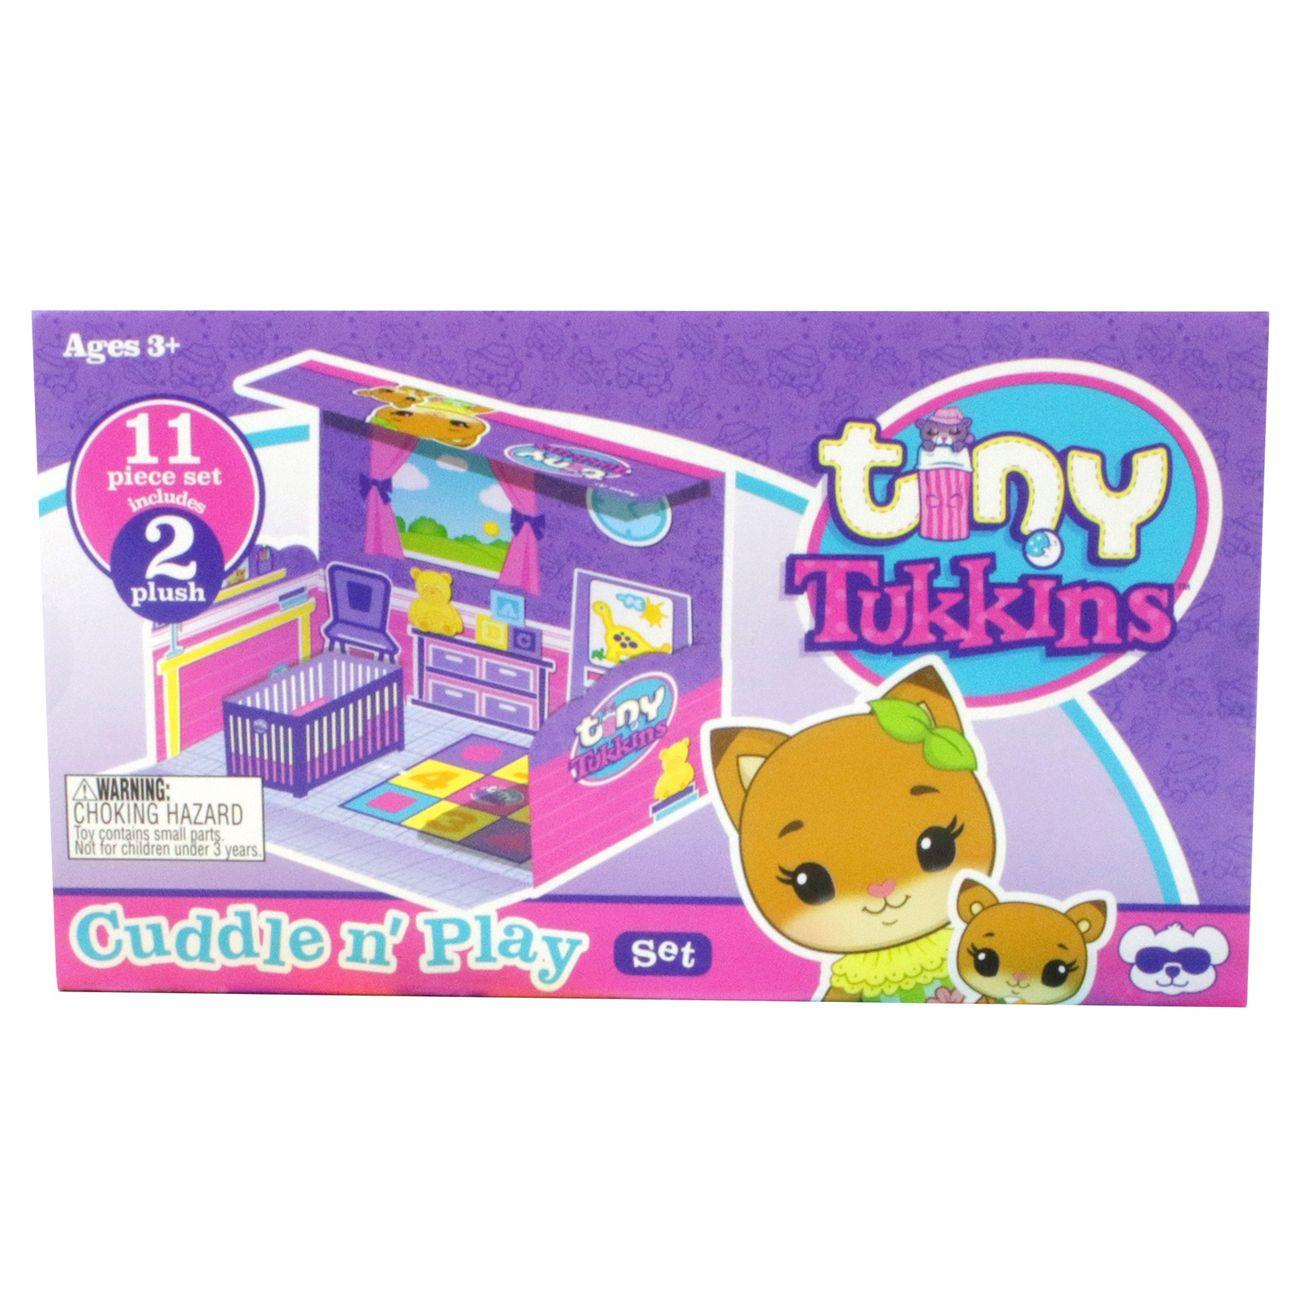 Tiny Tukkins - 11 pcs. Playset - Cuddle of play